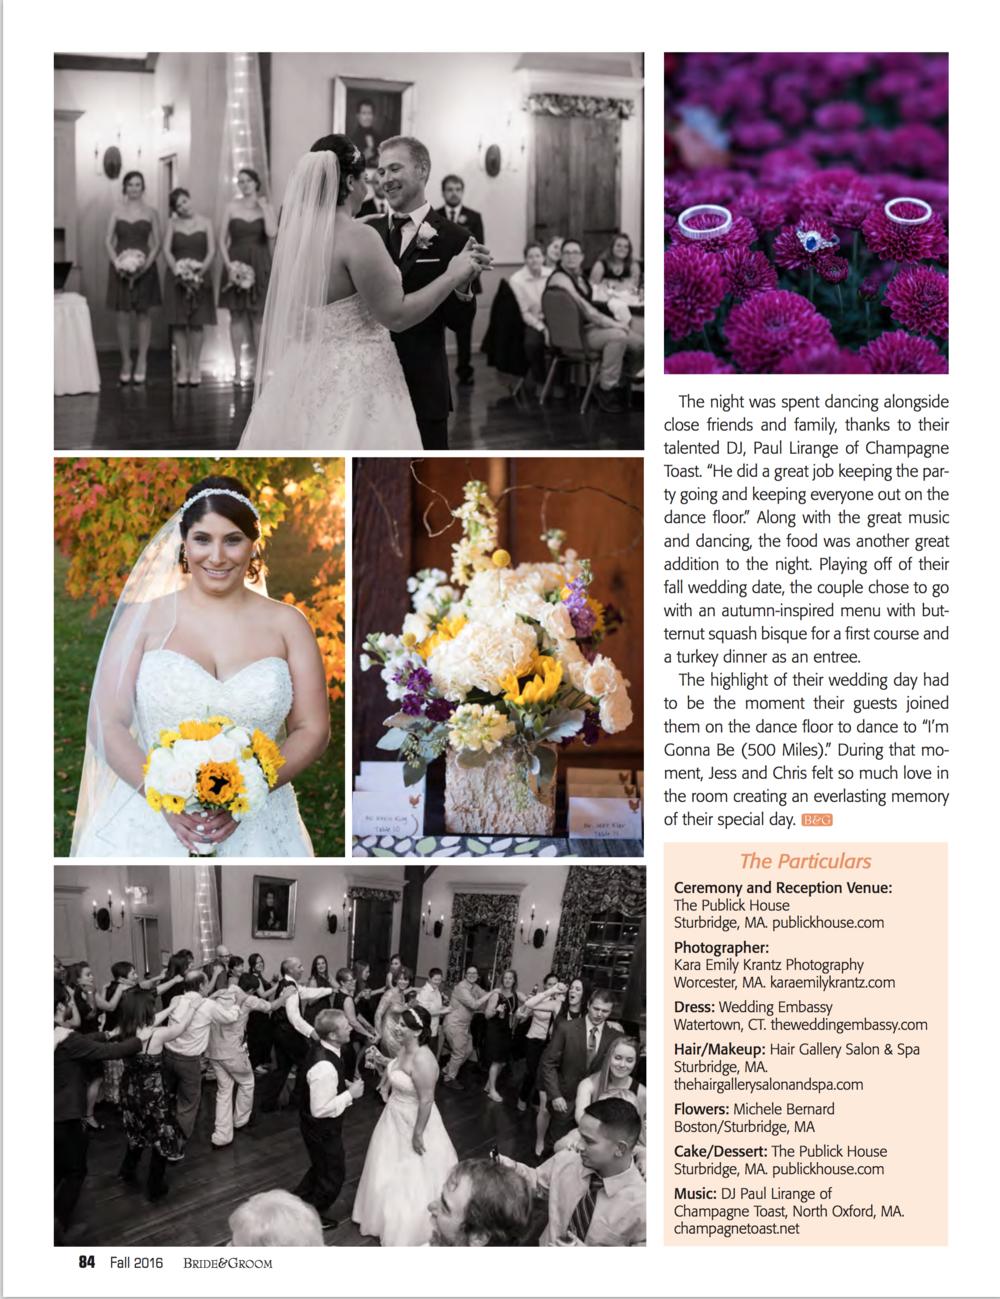 Kara Emily Krantz Photography, New England Outdoor wedding photographer featured in Bride & Groom Magazine.